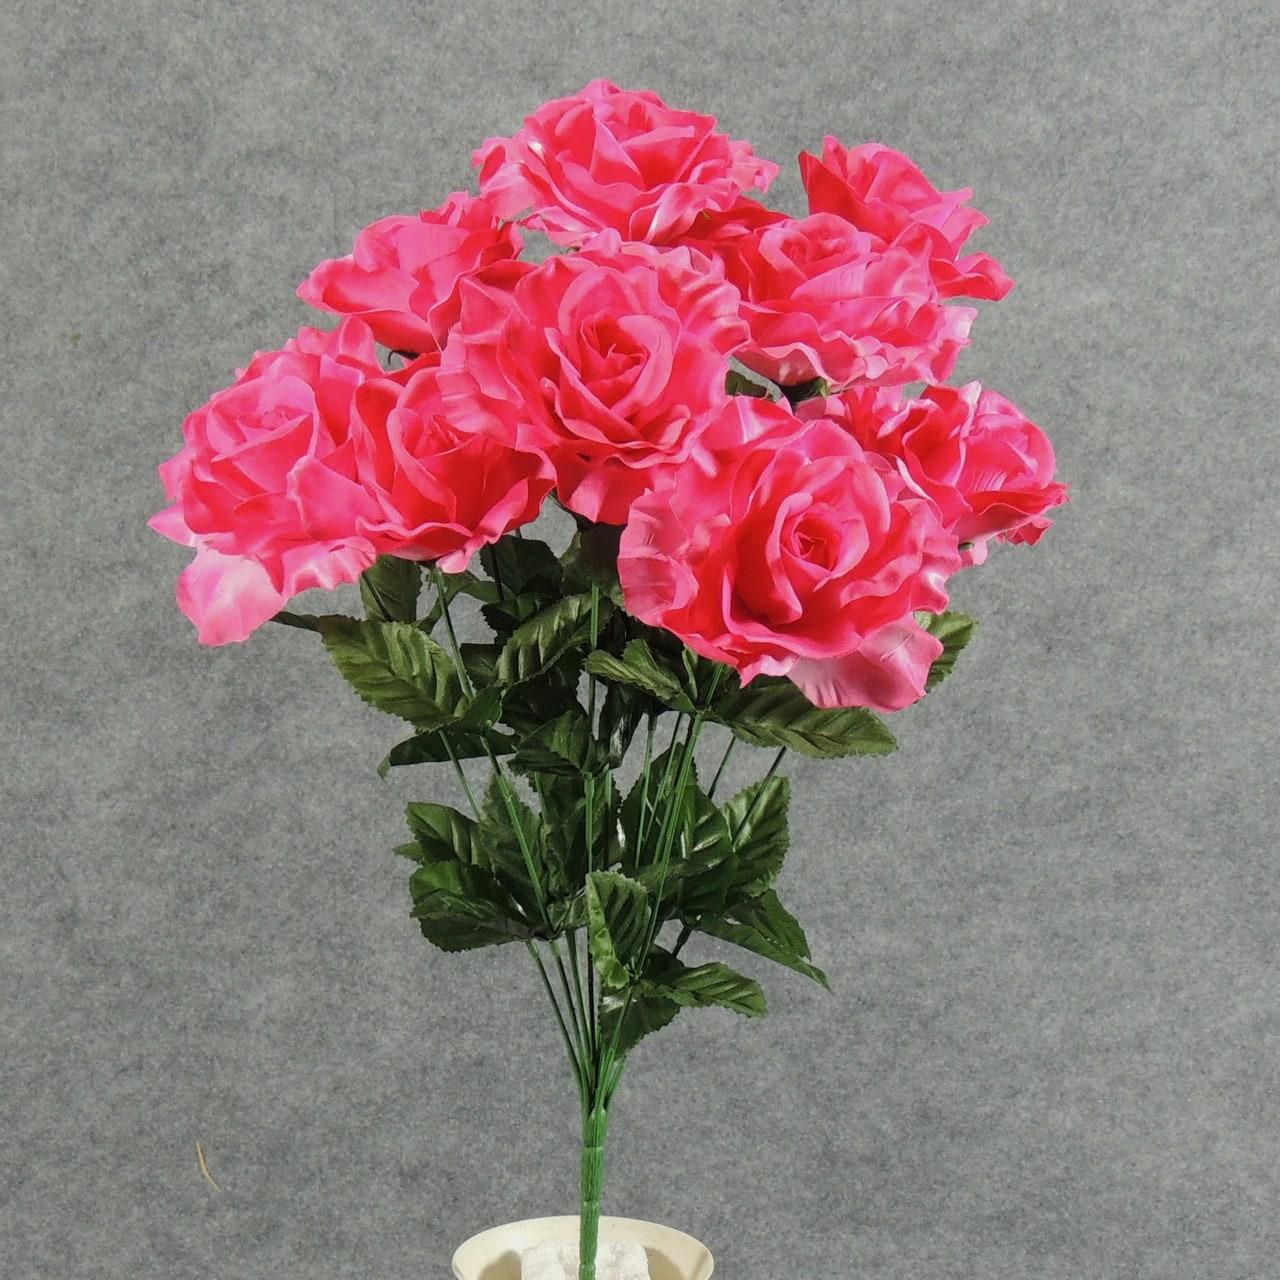 Shop 1 Pc 20 Inch Artificial Open Rose Bush W12 Blooms Add